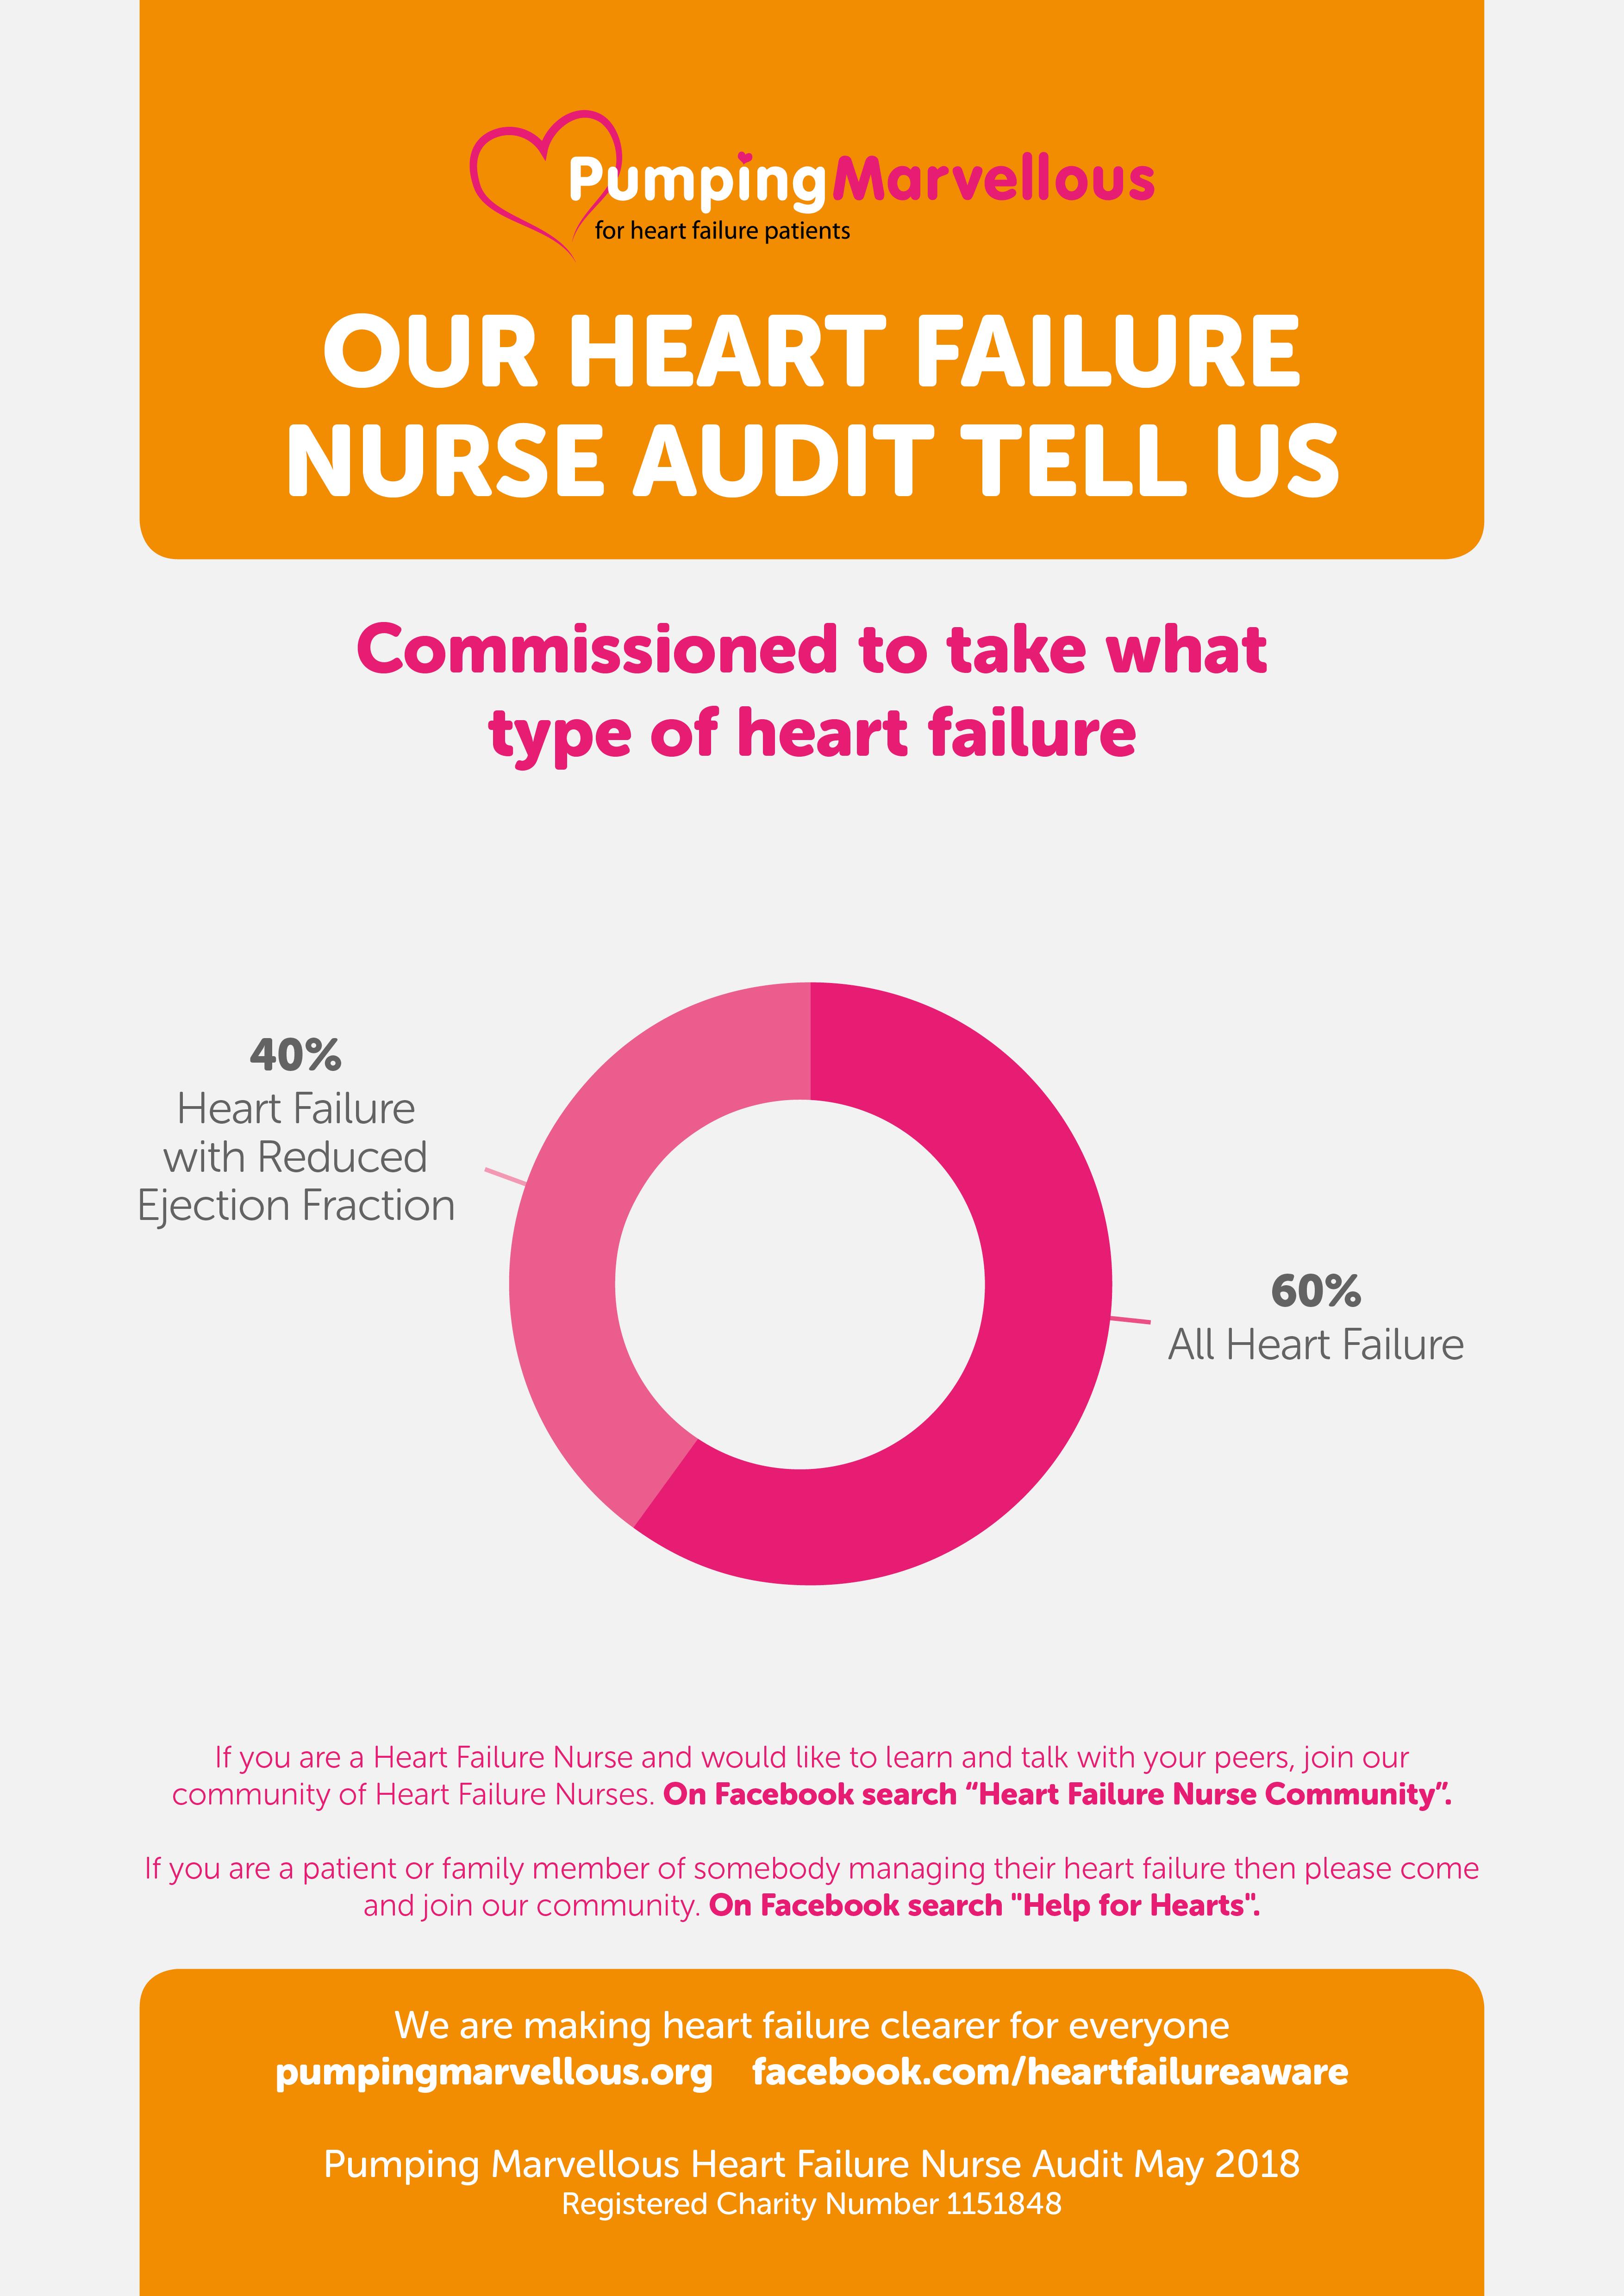 Heart Failure Nurse Audit 2018